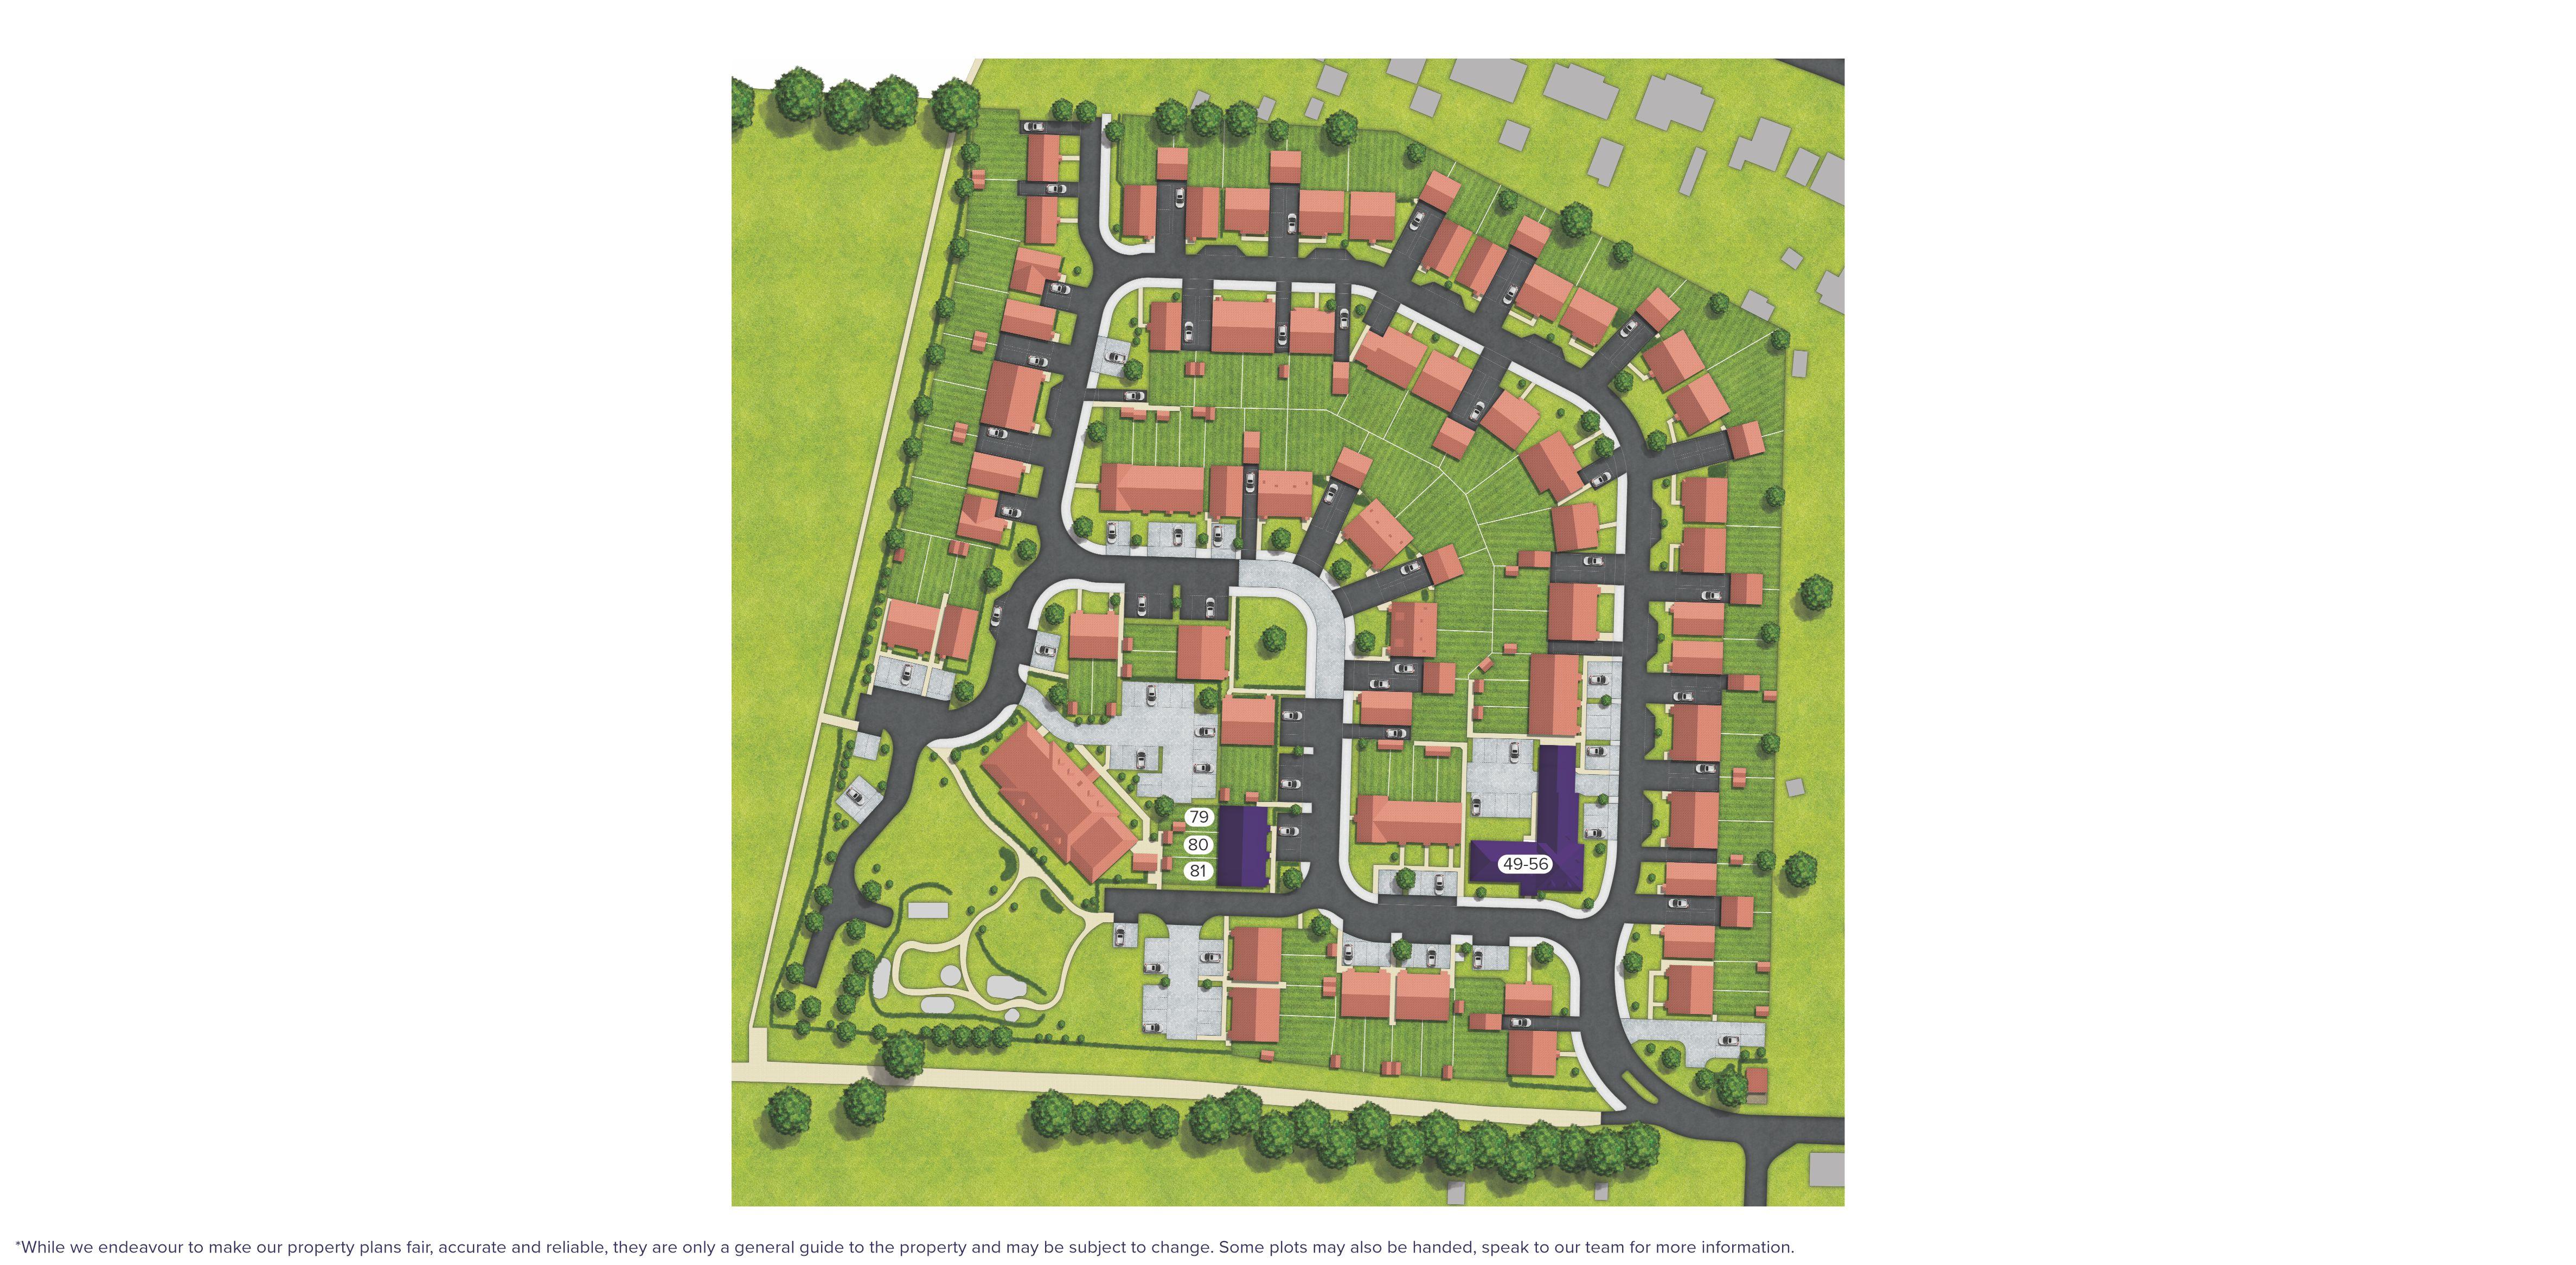 Green Lane Meadows, Farnham site map